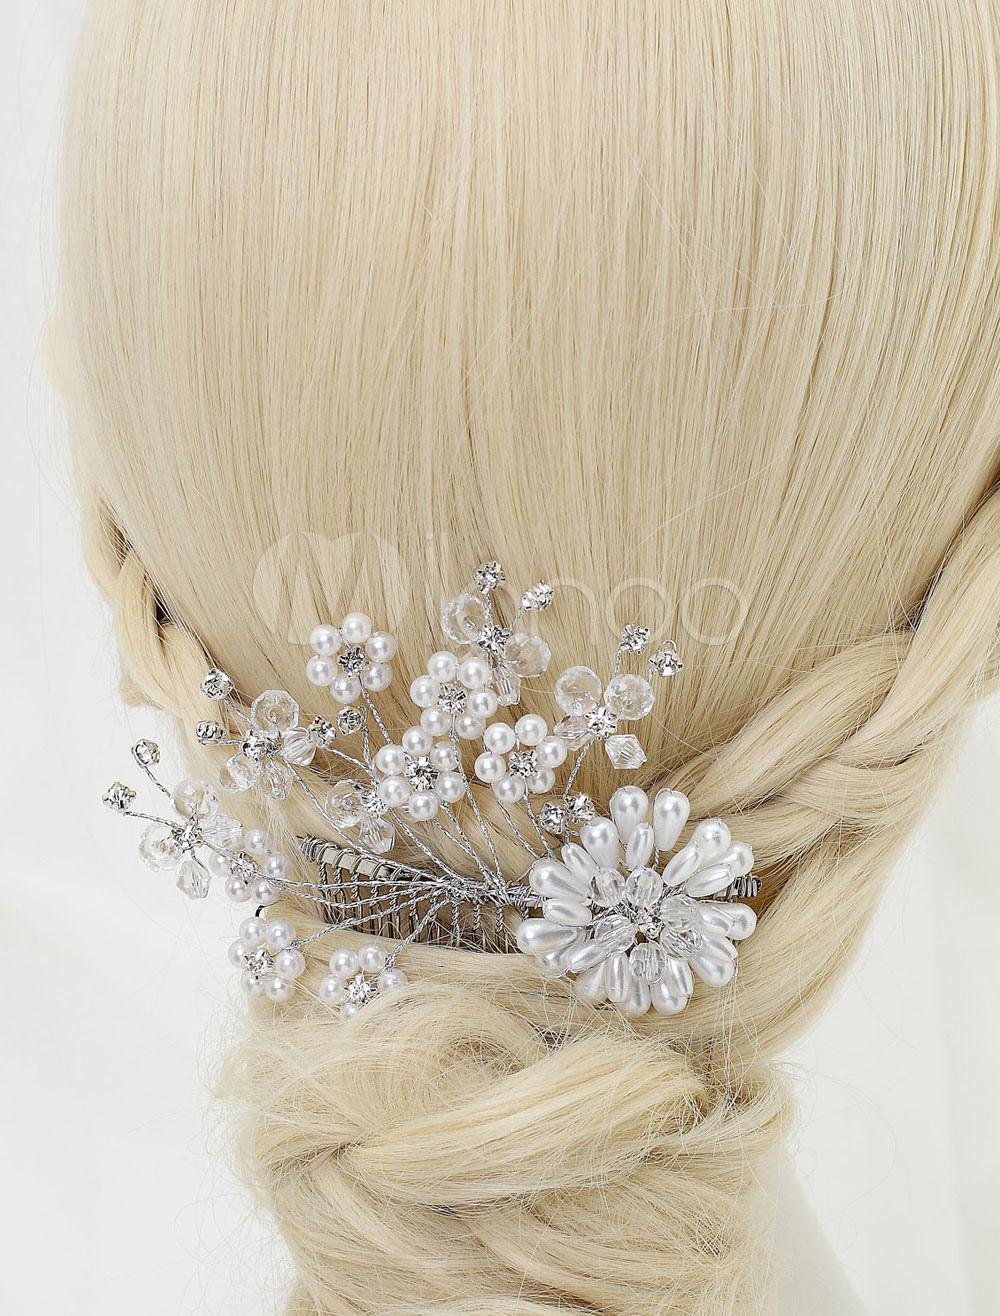 Buy Bridal Pearl Headpiece Comb Wedding Tiara Rhinestone Hair Pin  (11 Cm X 9.2 Cm X 1 Cm ) for $9.99 in Milanoo store